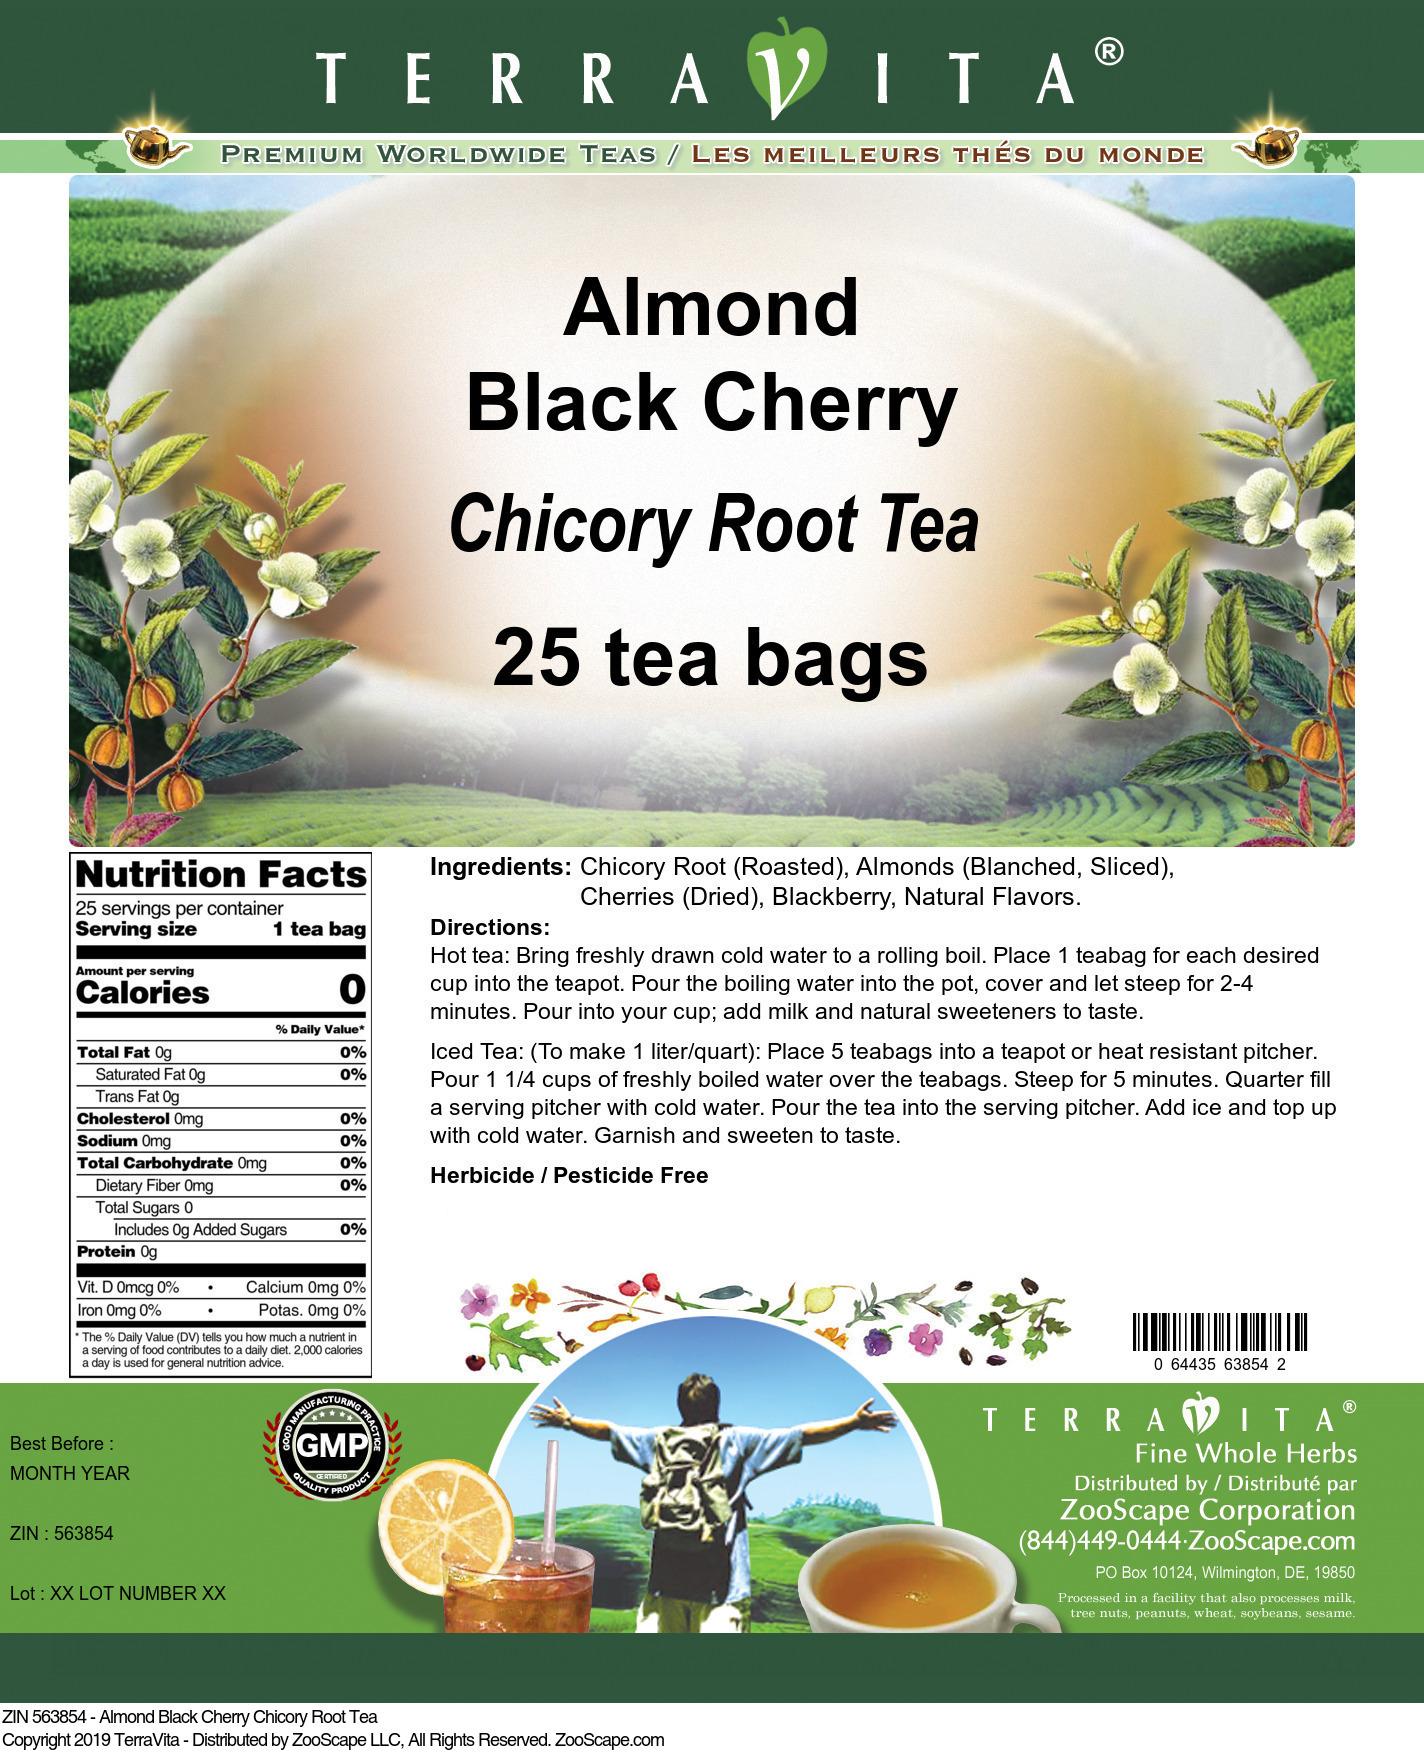 Almond Black Cherry Chicory Root Tea